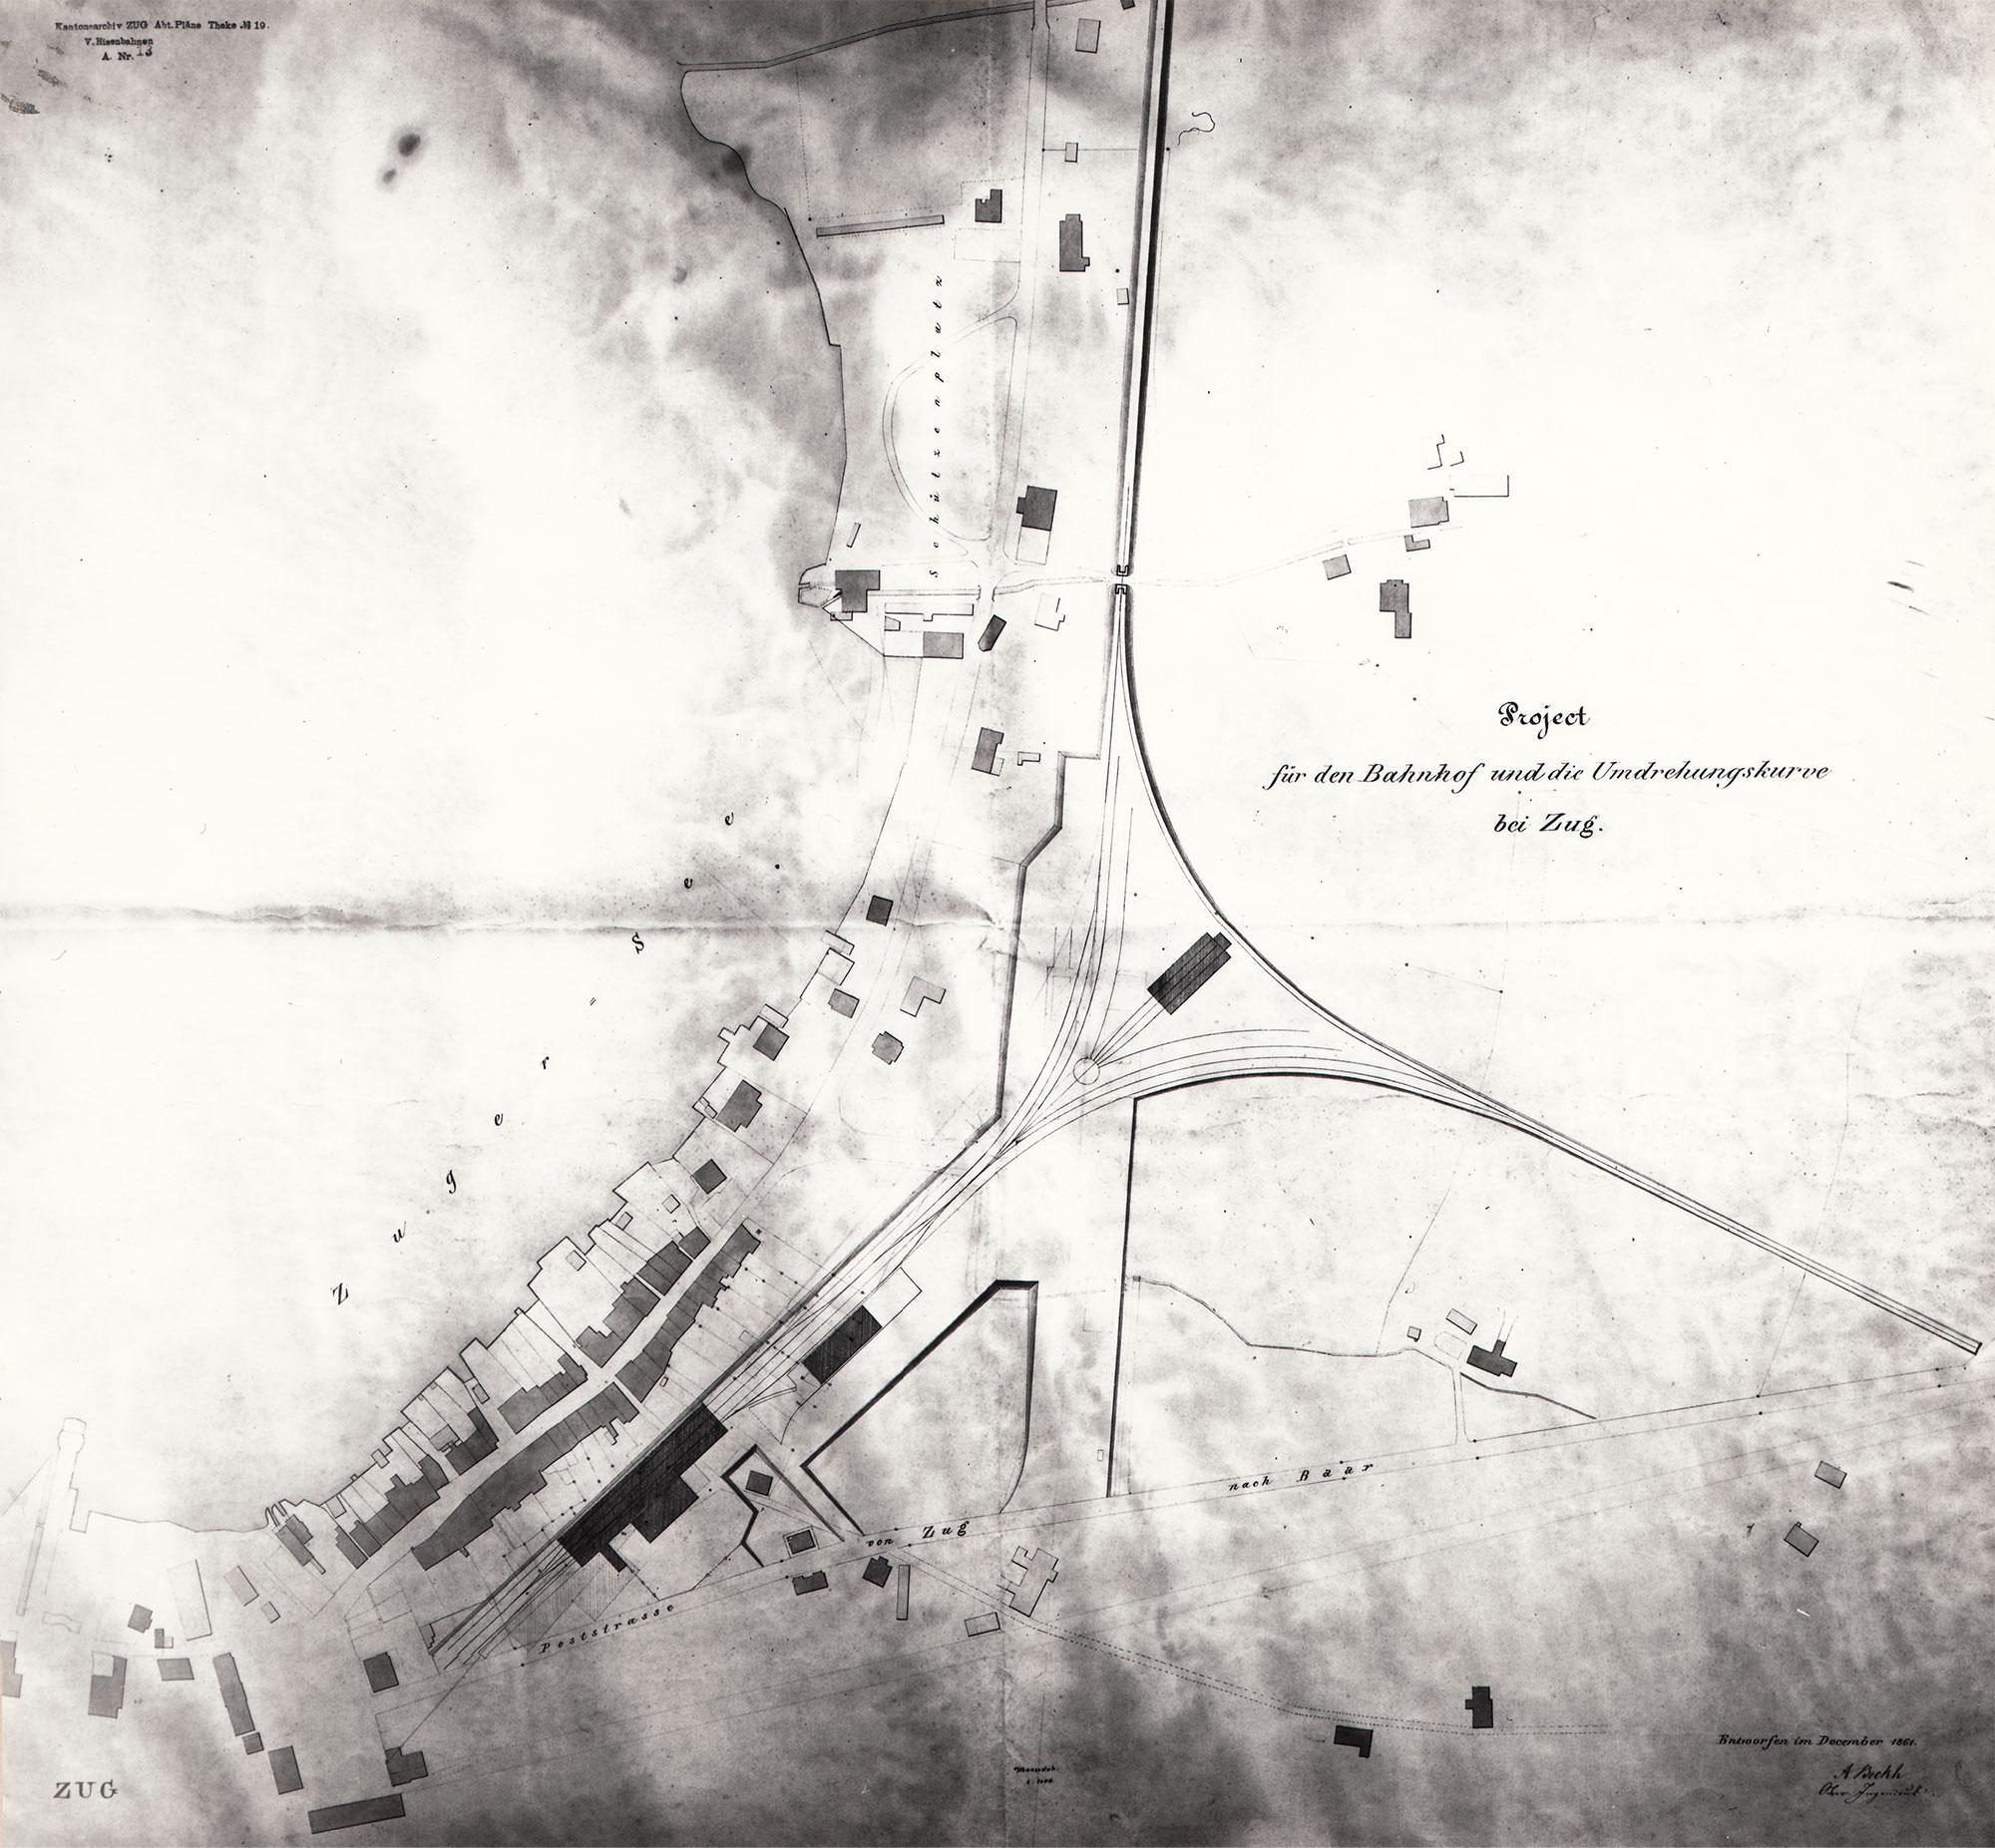 Bahnhof Zug Plan 1861